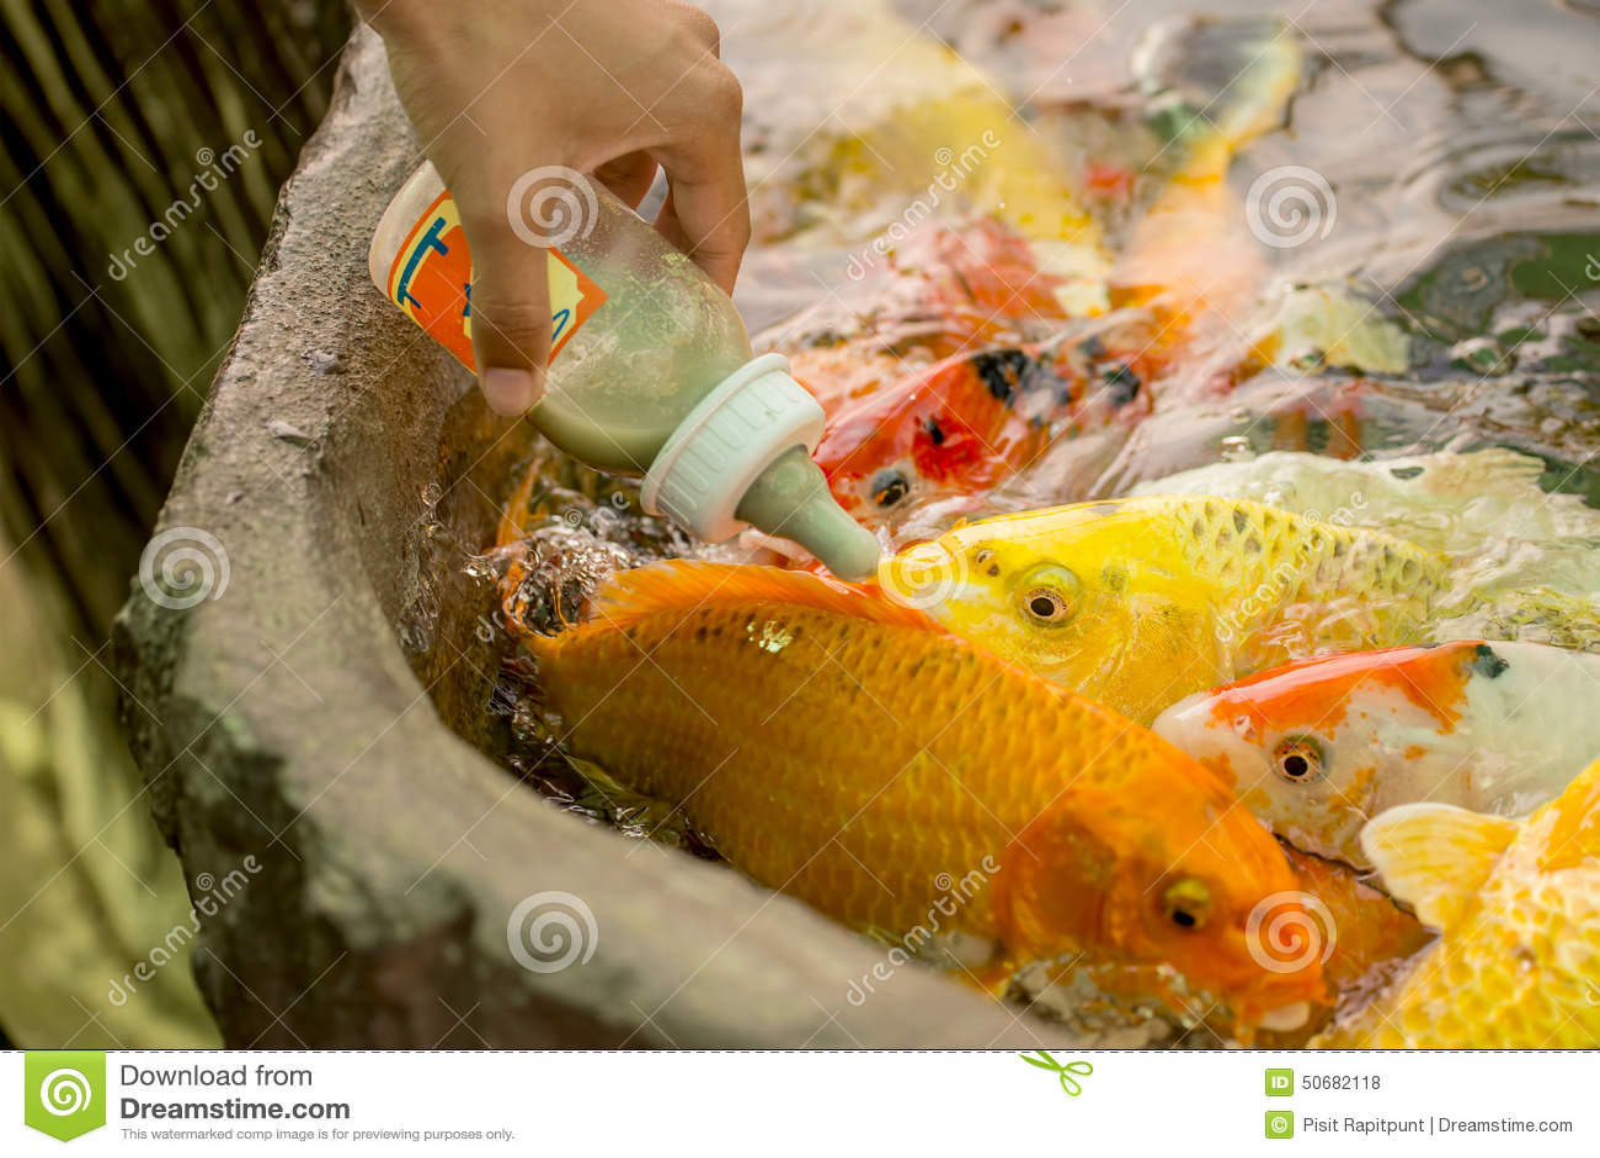 Download 哺养的饥饿的花梢鲤鱼在水池钓鱼 库存照片. 图片 包括有 五颜六色, 饥饿, 室外, 徽章, 食物, 许多 - 50682118